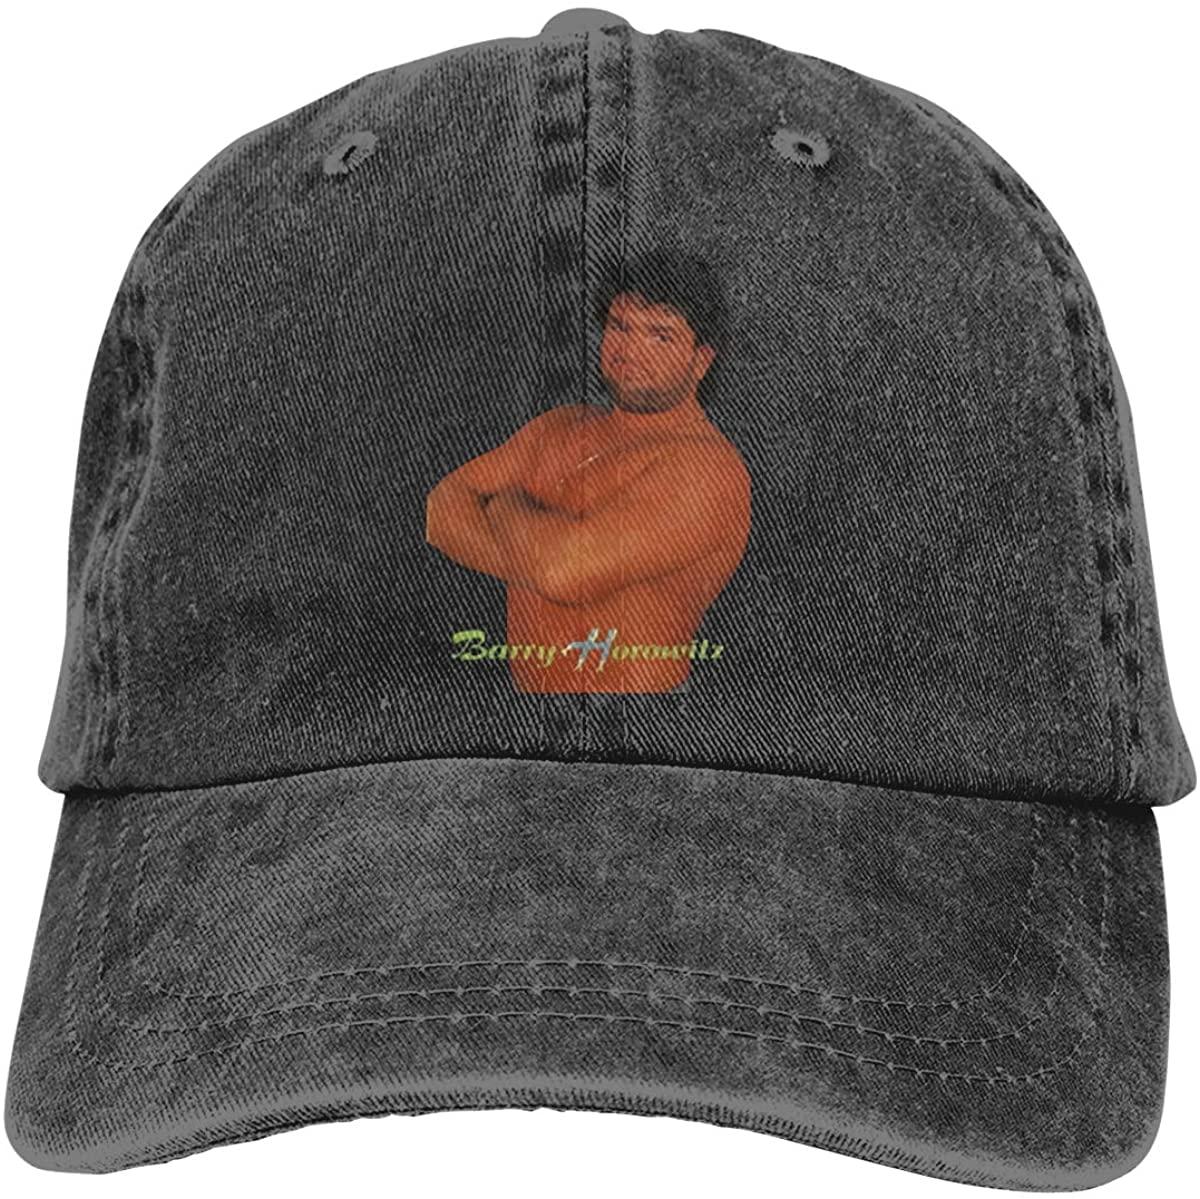 GOOANGUS Barry Horowitz Retro Wrestling Adjustable Unisex Hat Baseball Caps Black